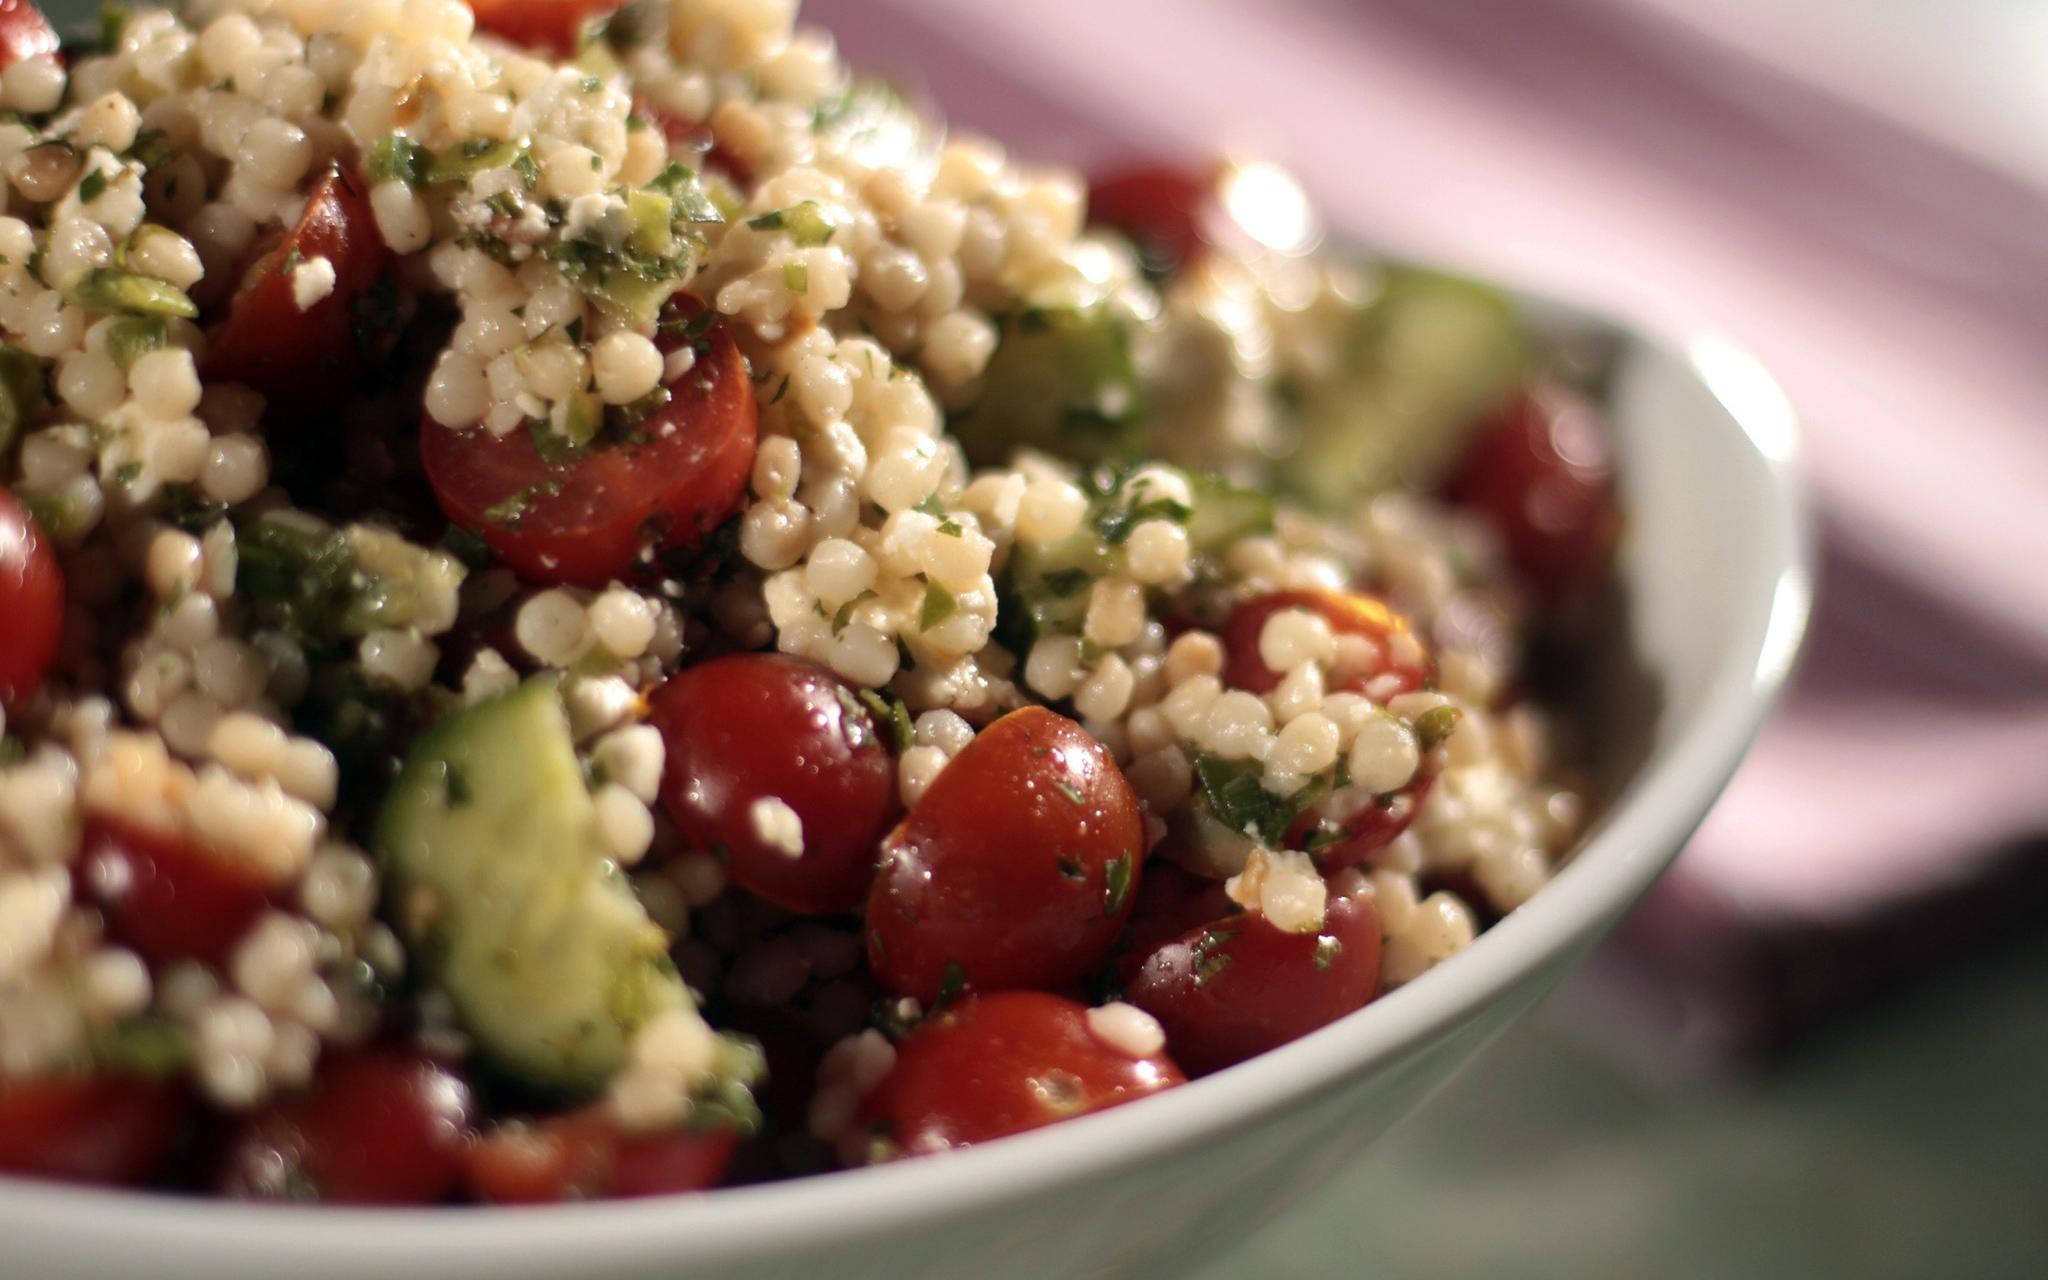 Israeli Couscous And California Avocado Salad Recipes — Dishmaps